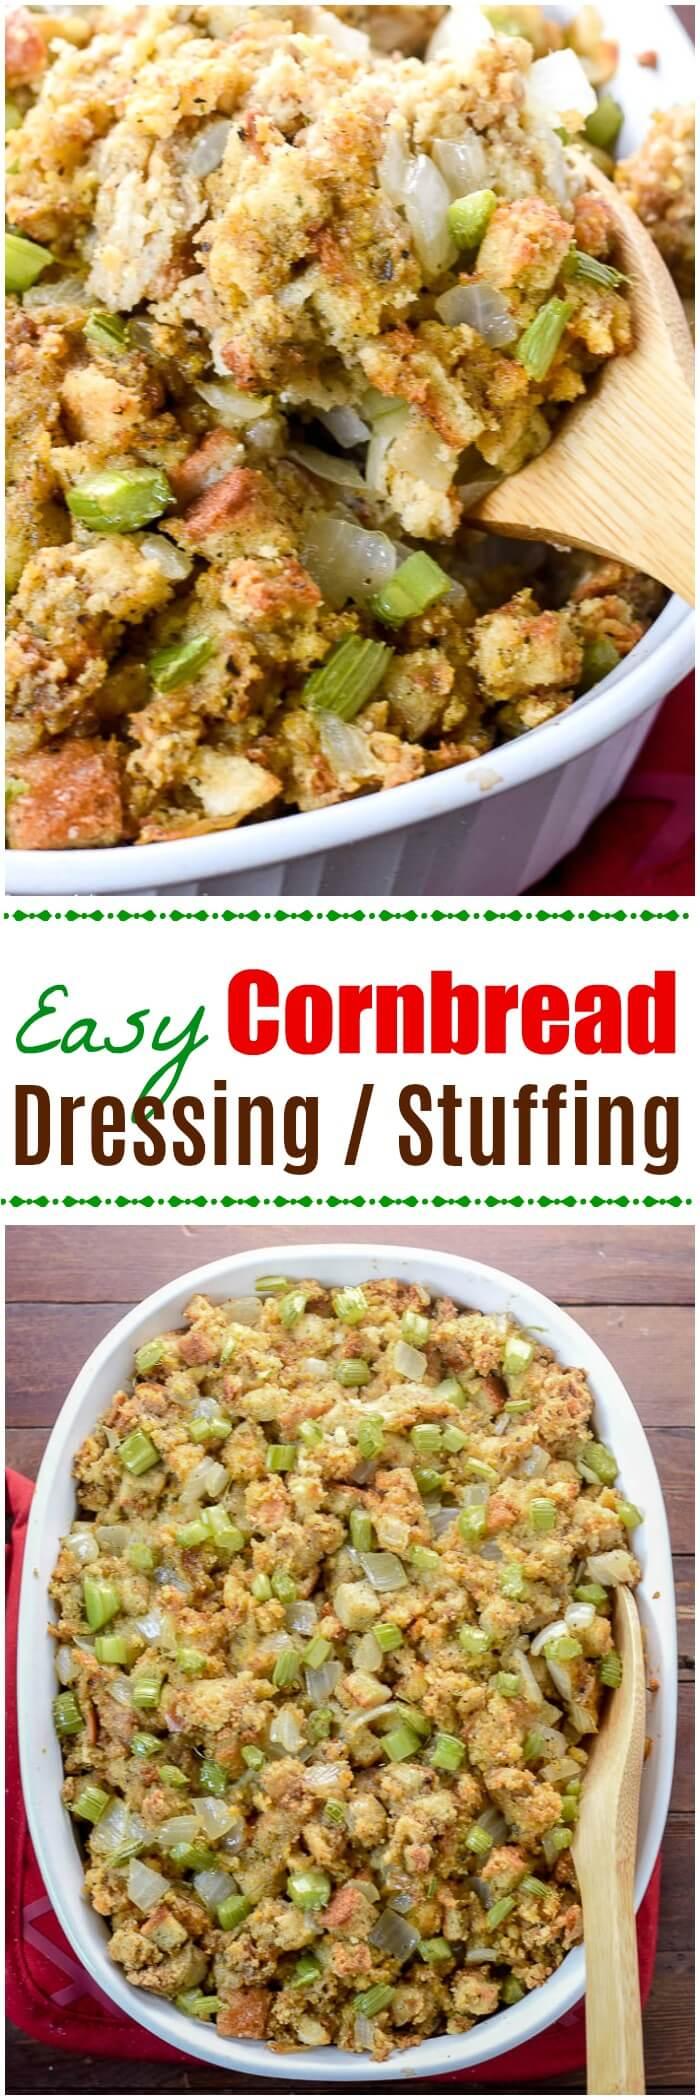 Easy Cornbread Dressing Stuffing